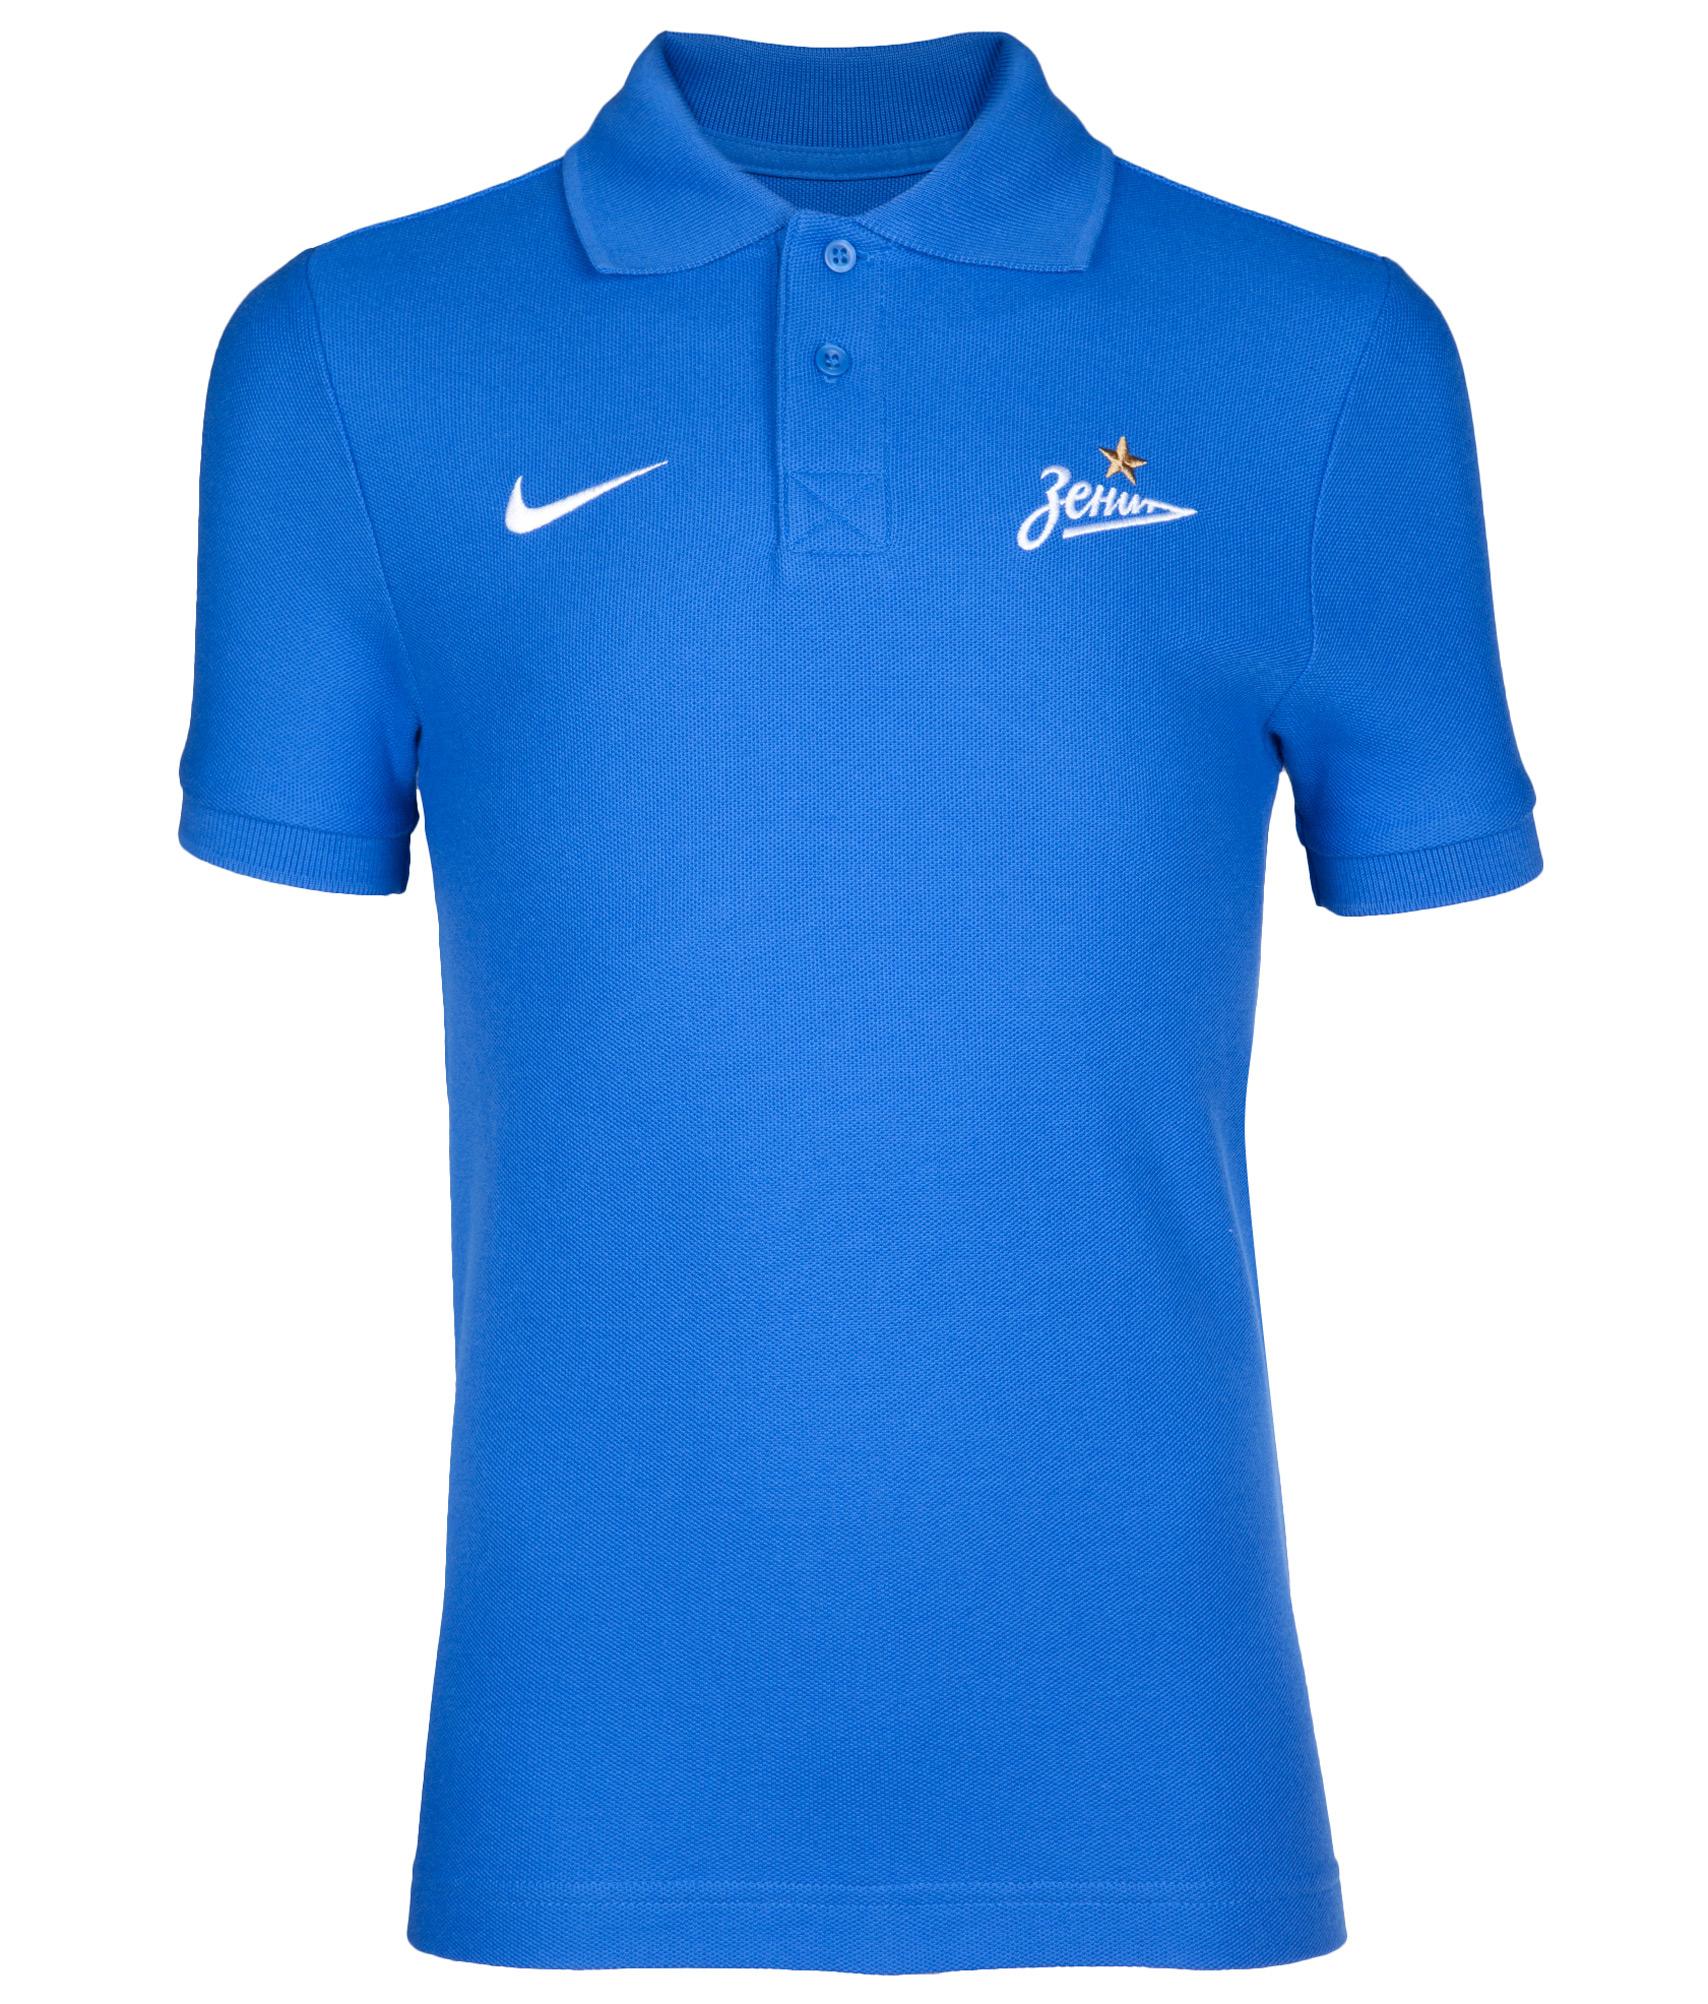 Поло подростковое Nike, Цвет-Синий, Размер-XS поло nike цвет голубой размер m